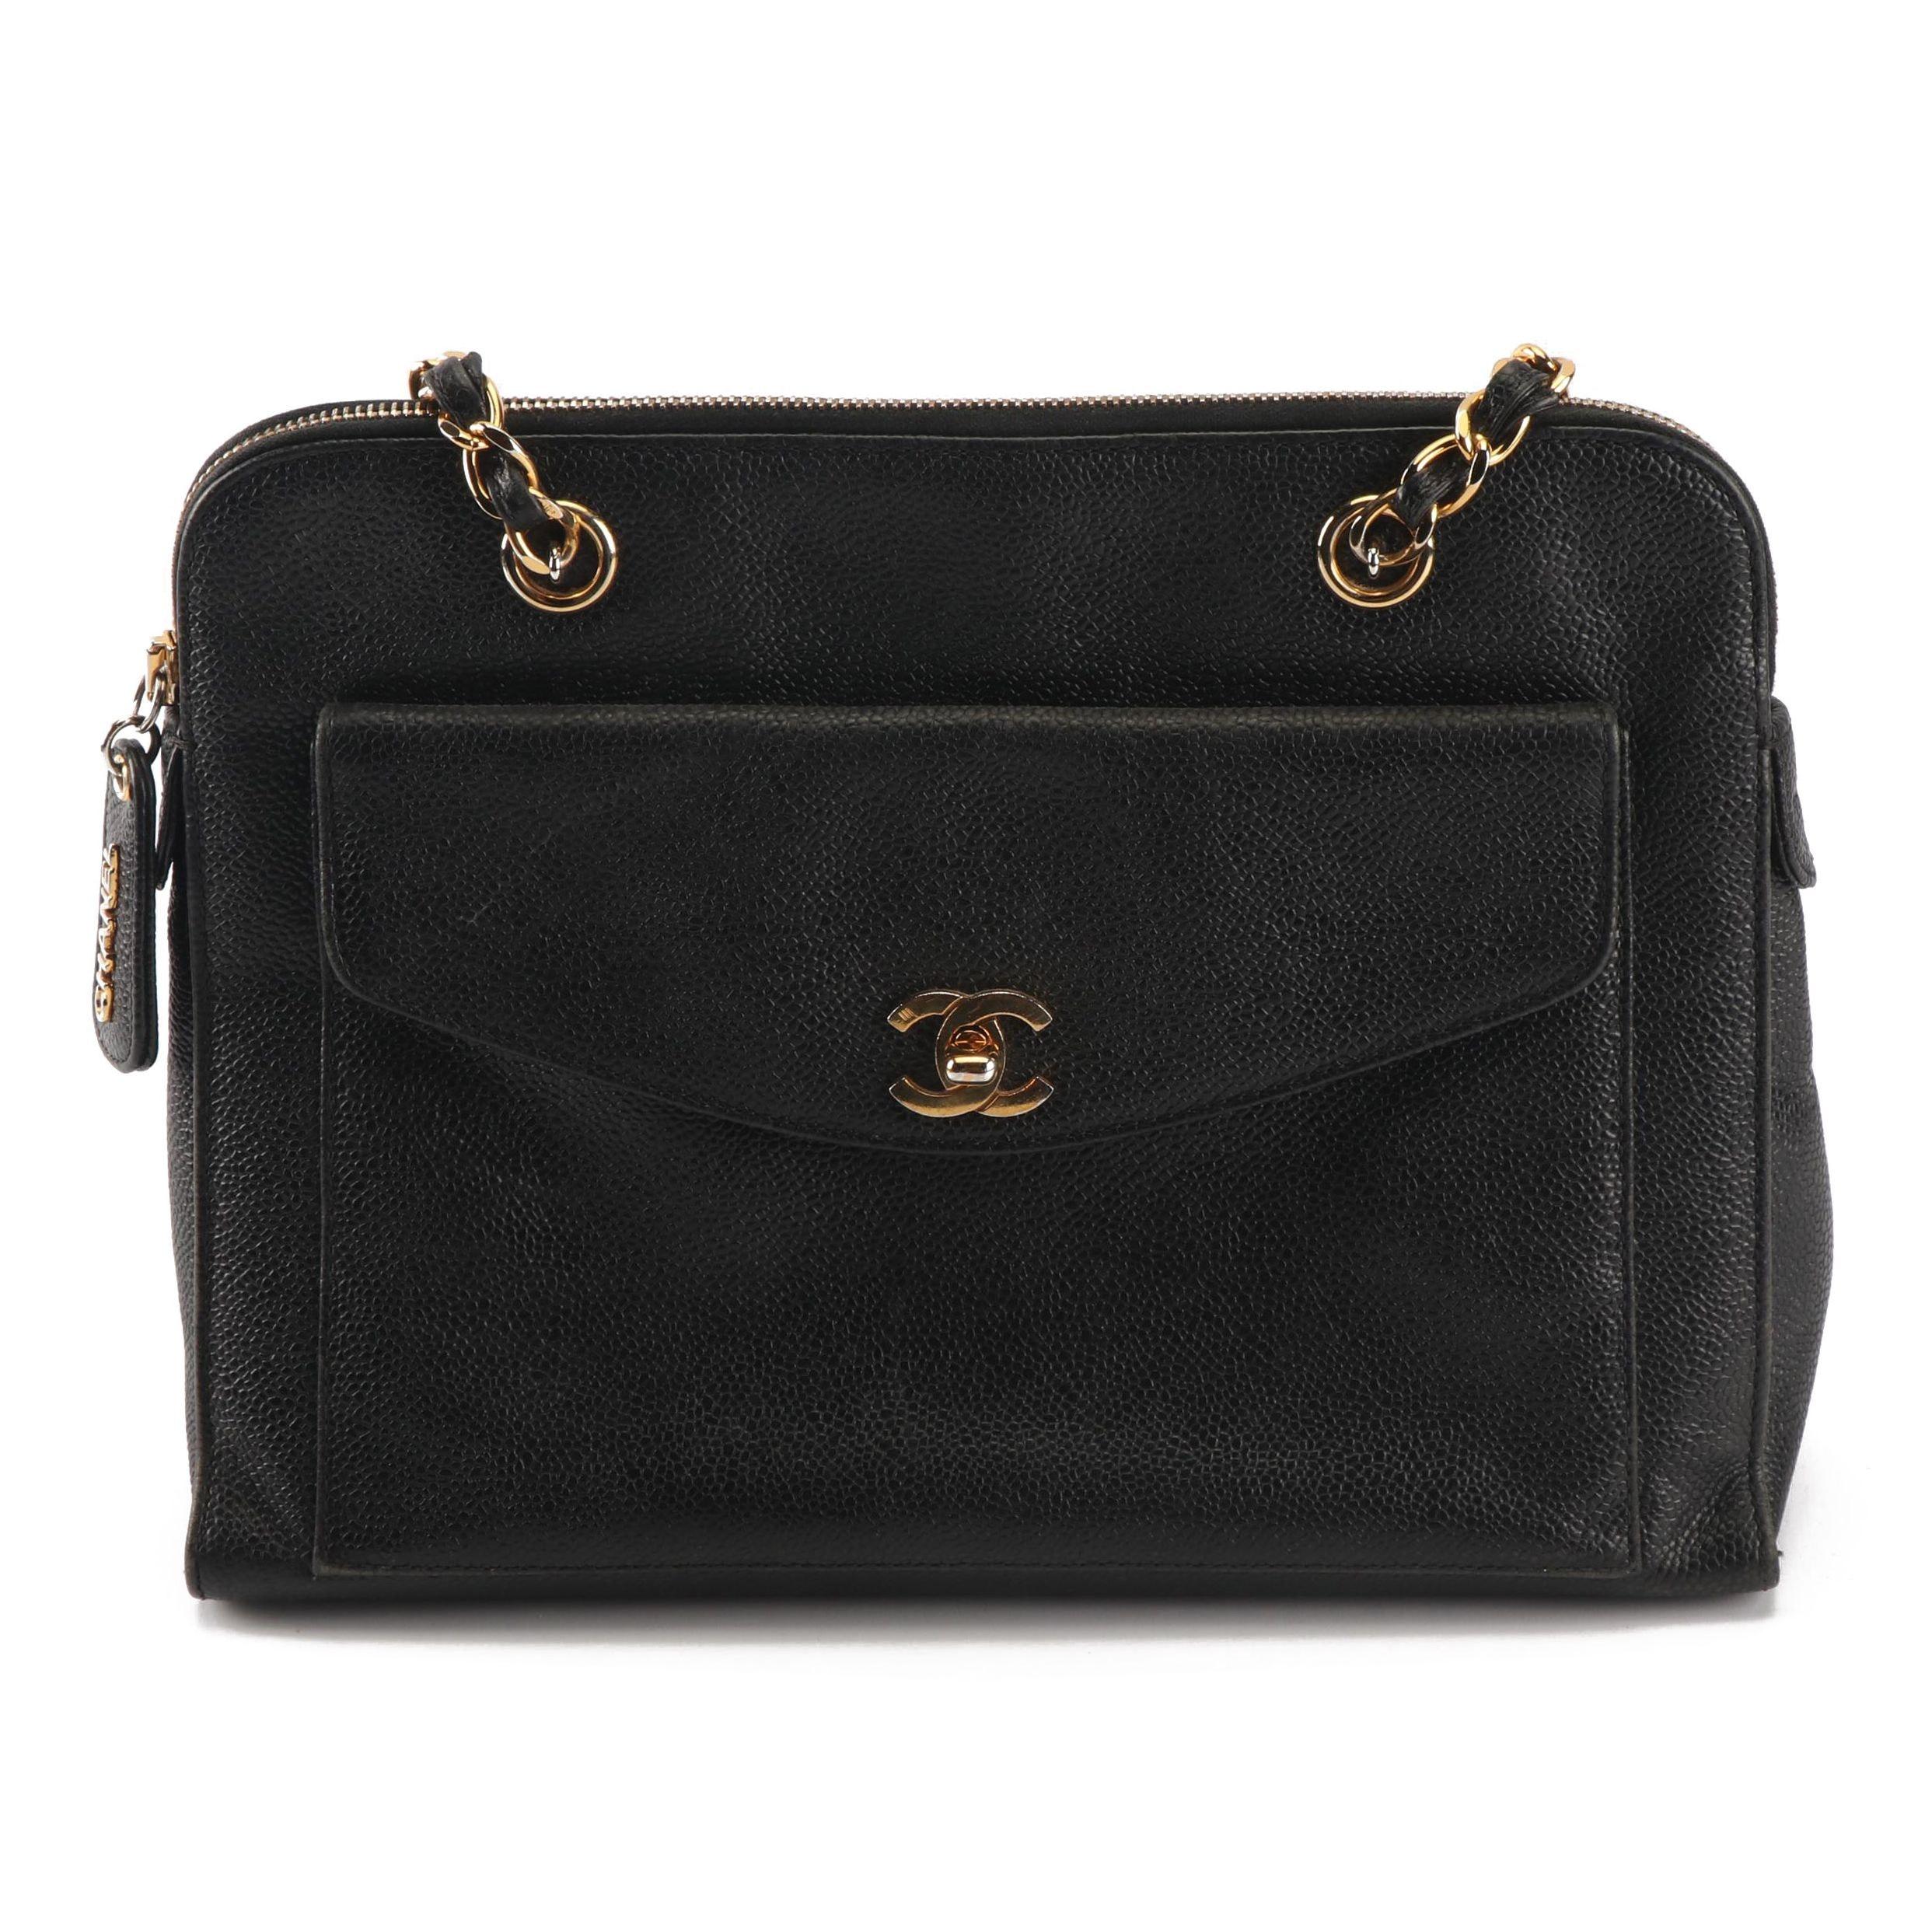 Vintage Chanel Black Caviar Leather CC Chain Handbag